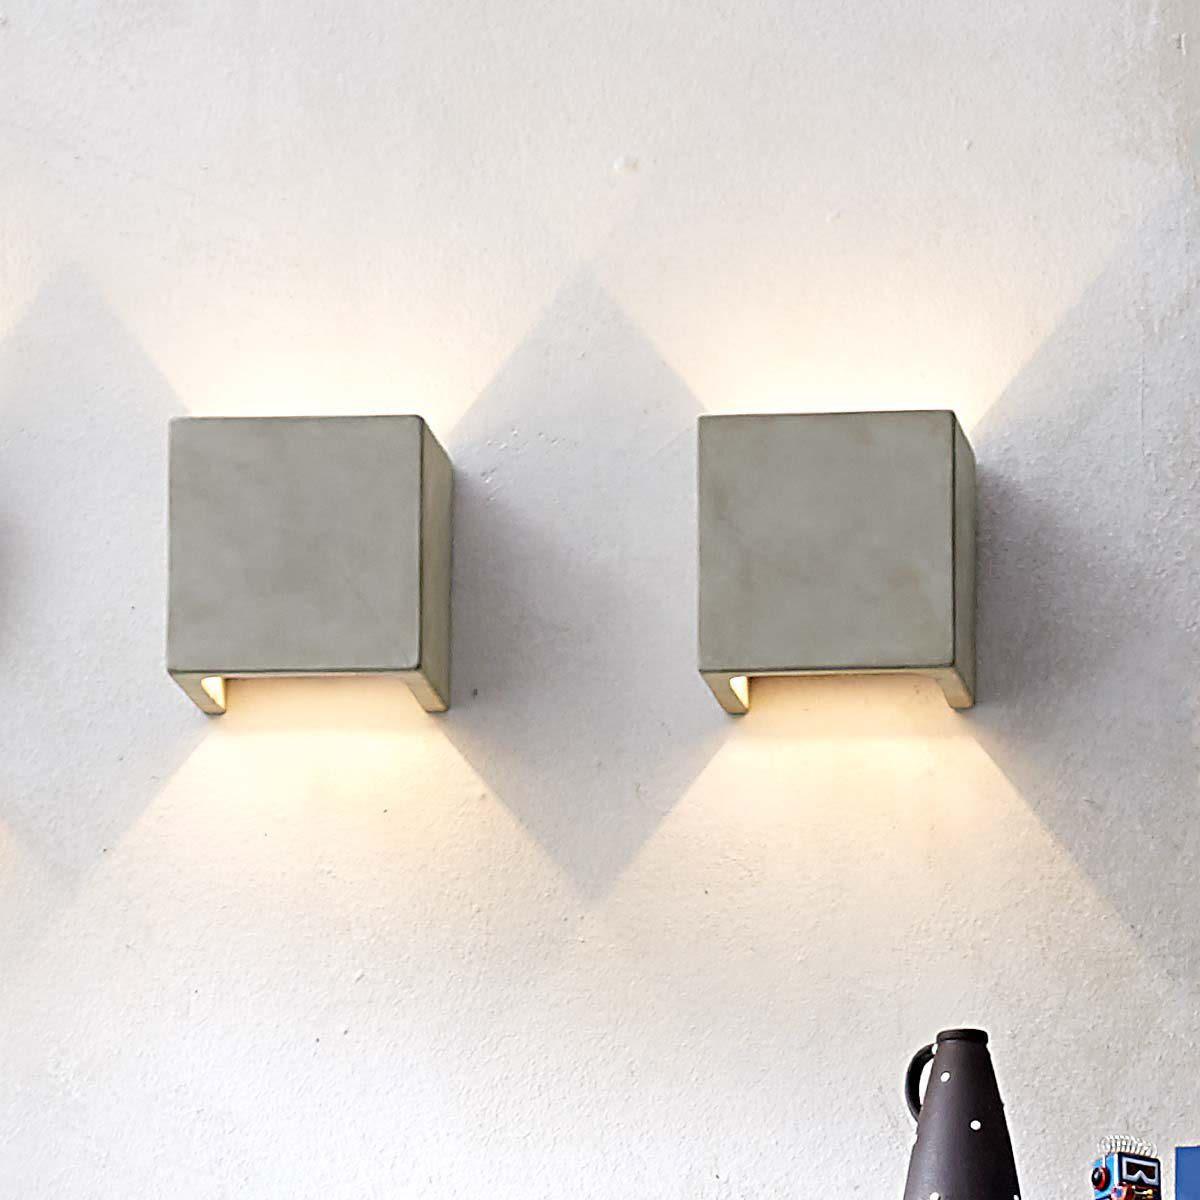 wandleuchte led dimmbar schwanenhals inspirierendes design f r wohnm bel. Black Bedroom Furniture Sets. Home Design Ideas